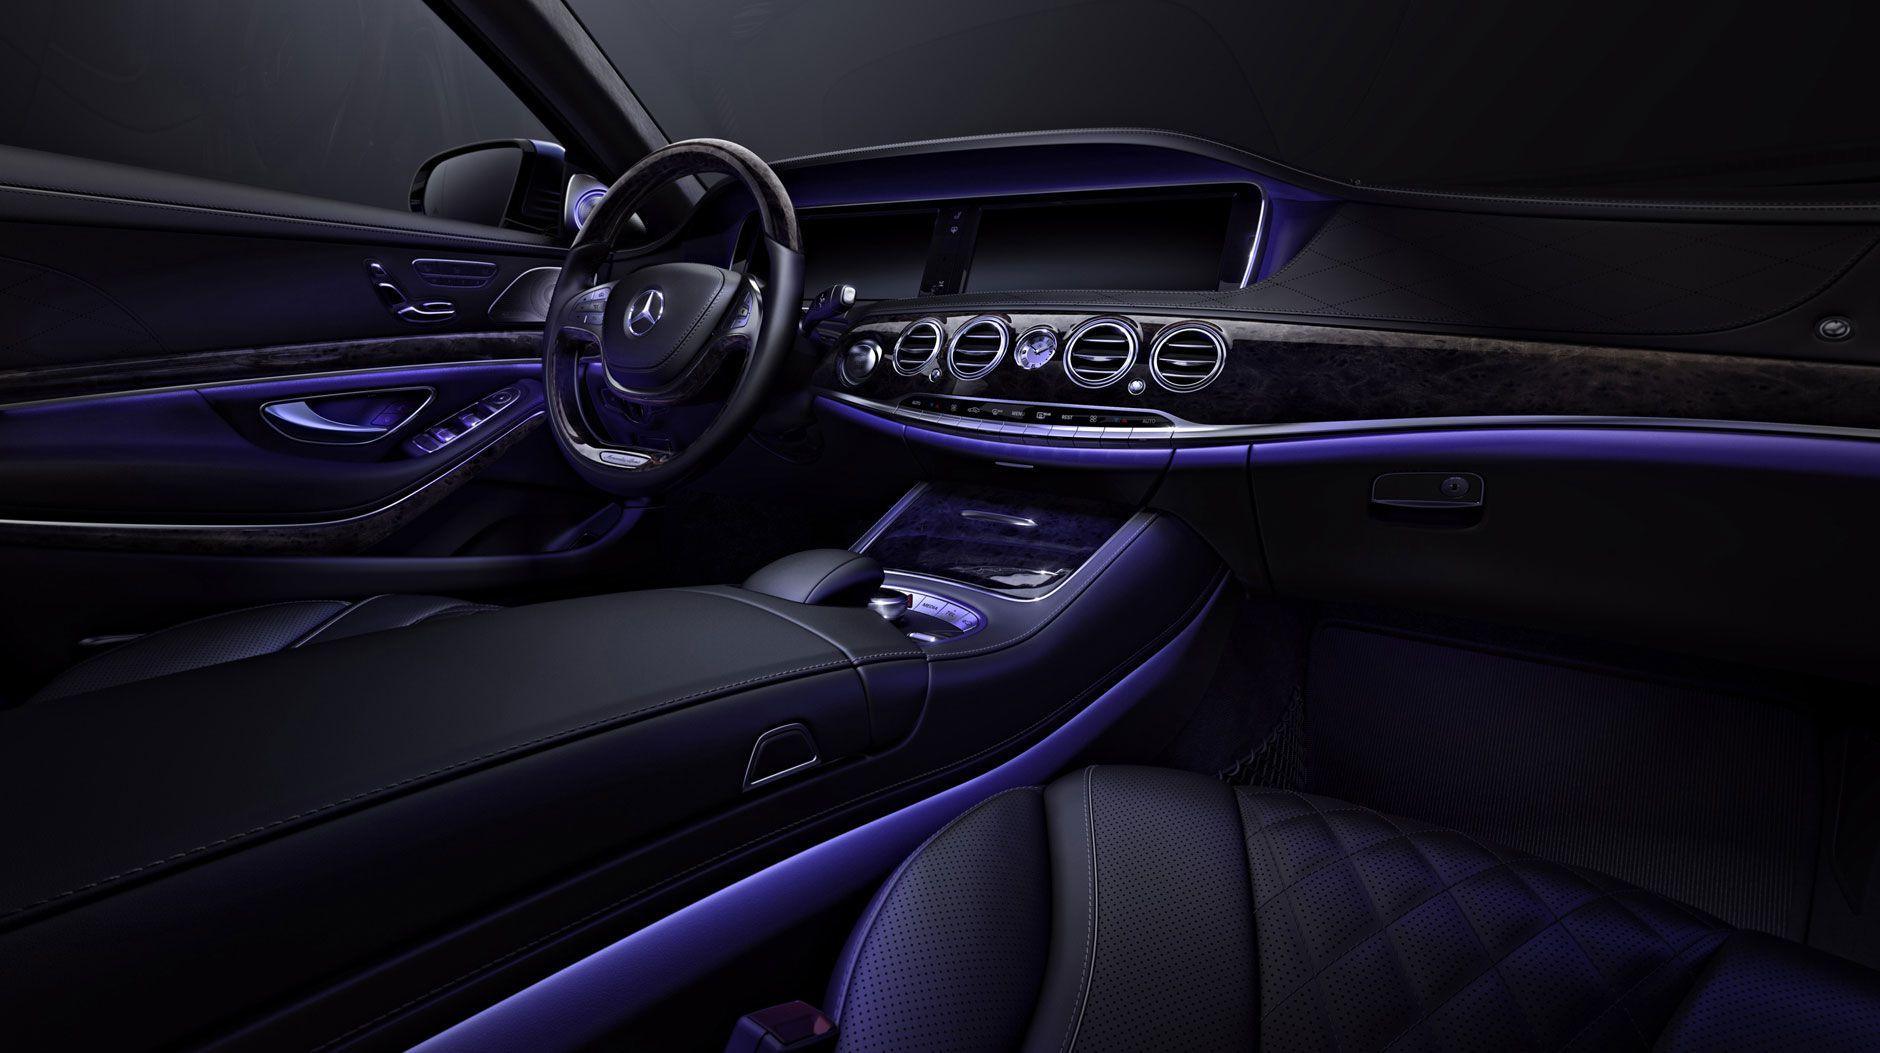 Mercedes Benz Poplar Wood on triumph wood, man wood, lotus wood, rolls royce wood, cord wood,